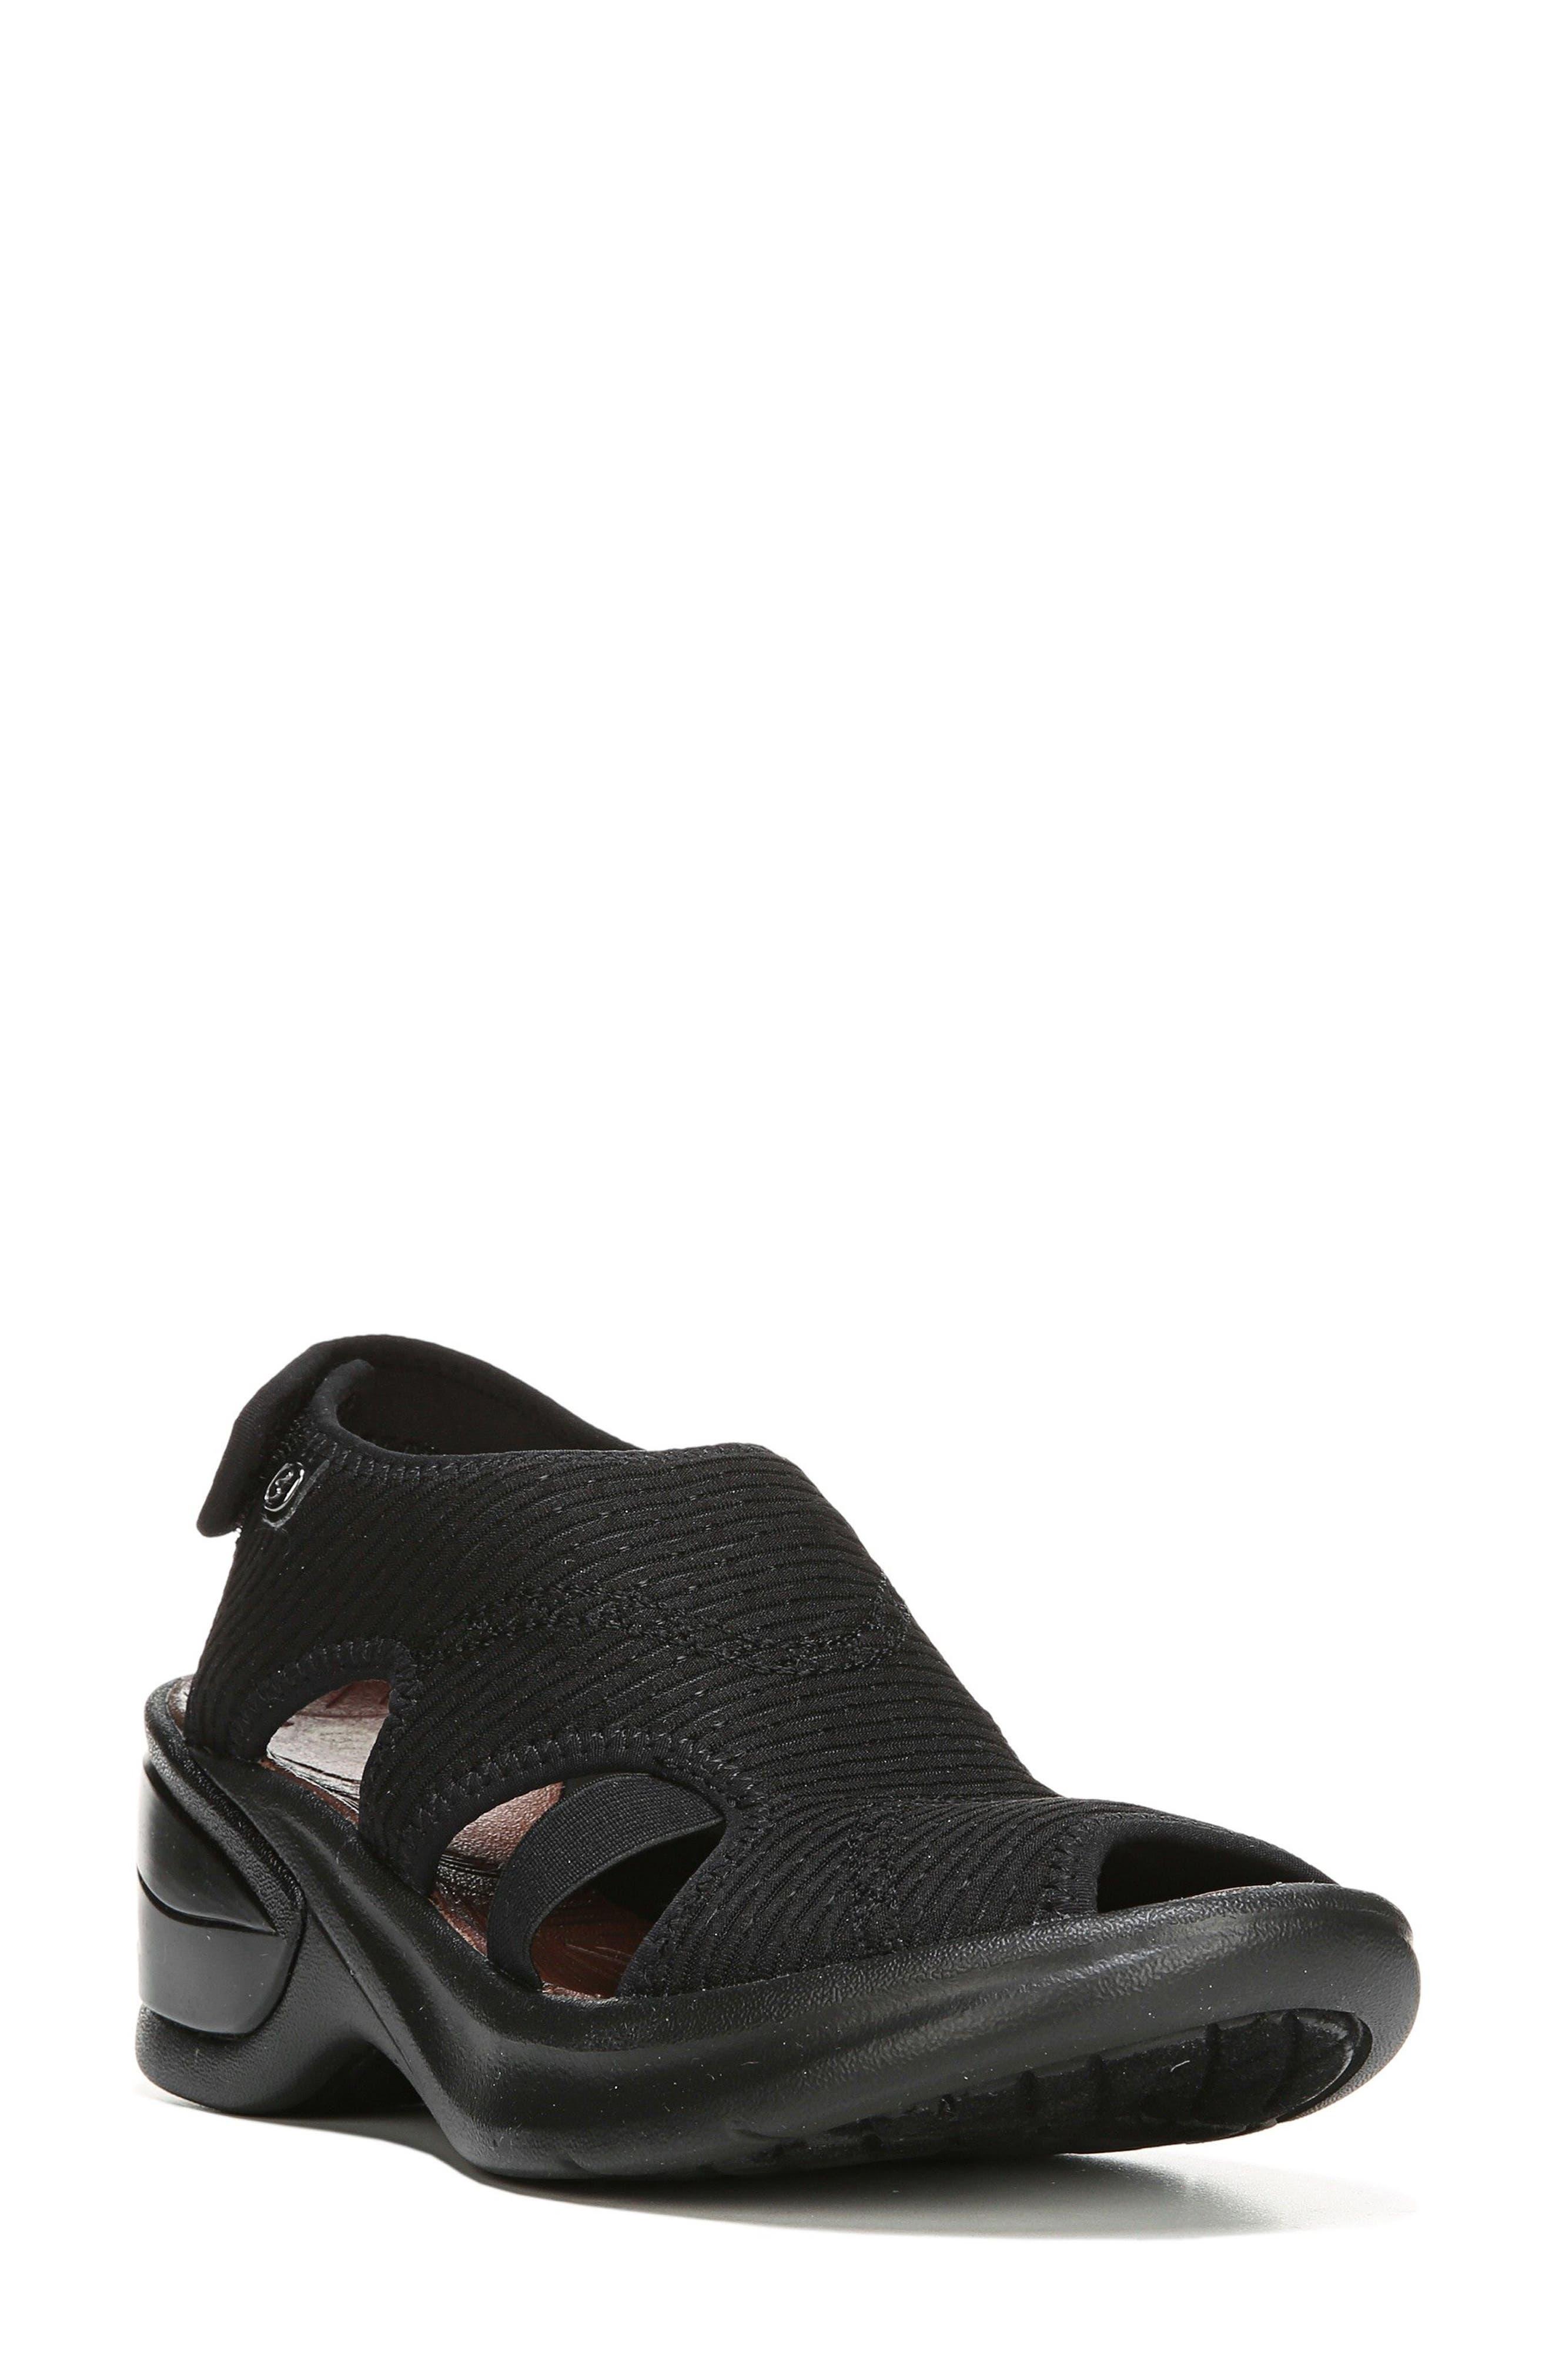 Kiss Sandal,                         Main,                         color, BLACK FABRIC